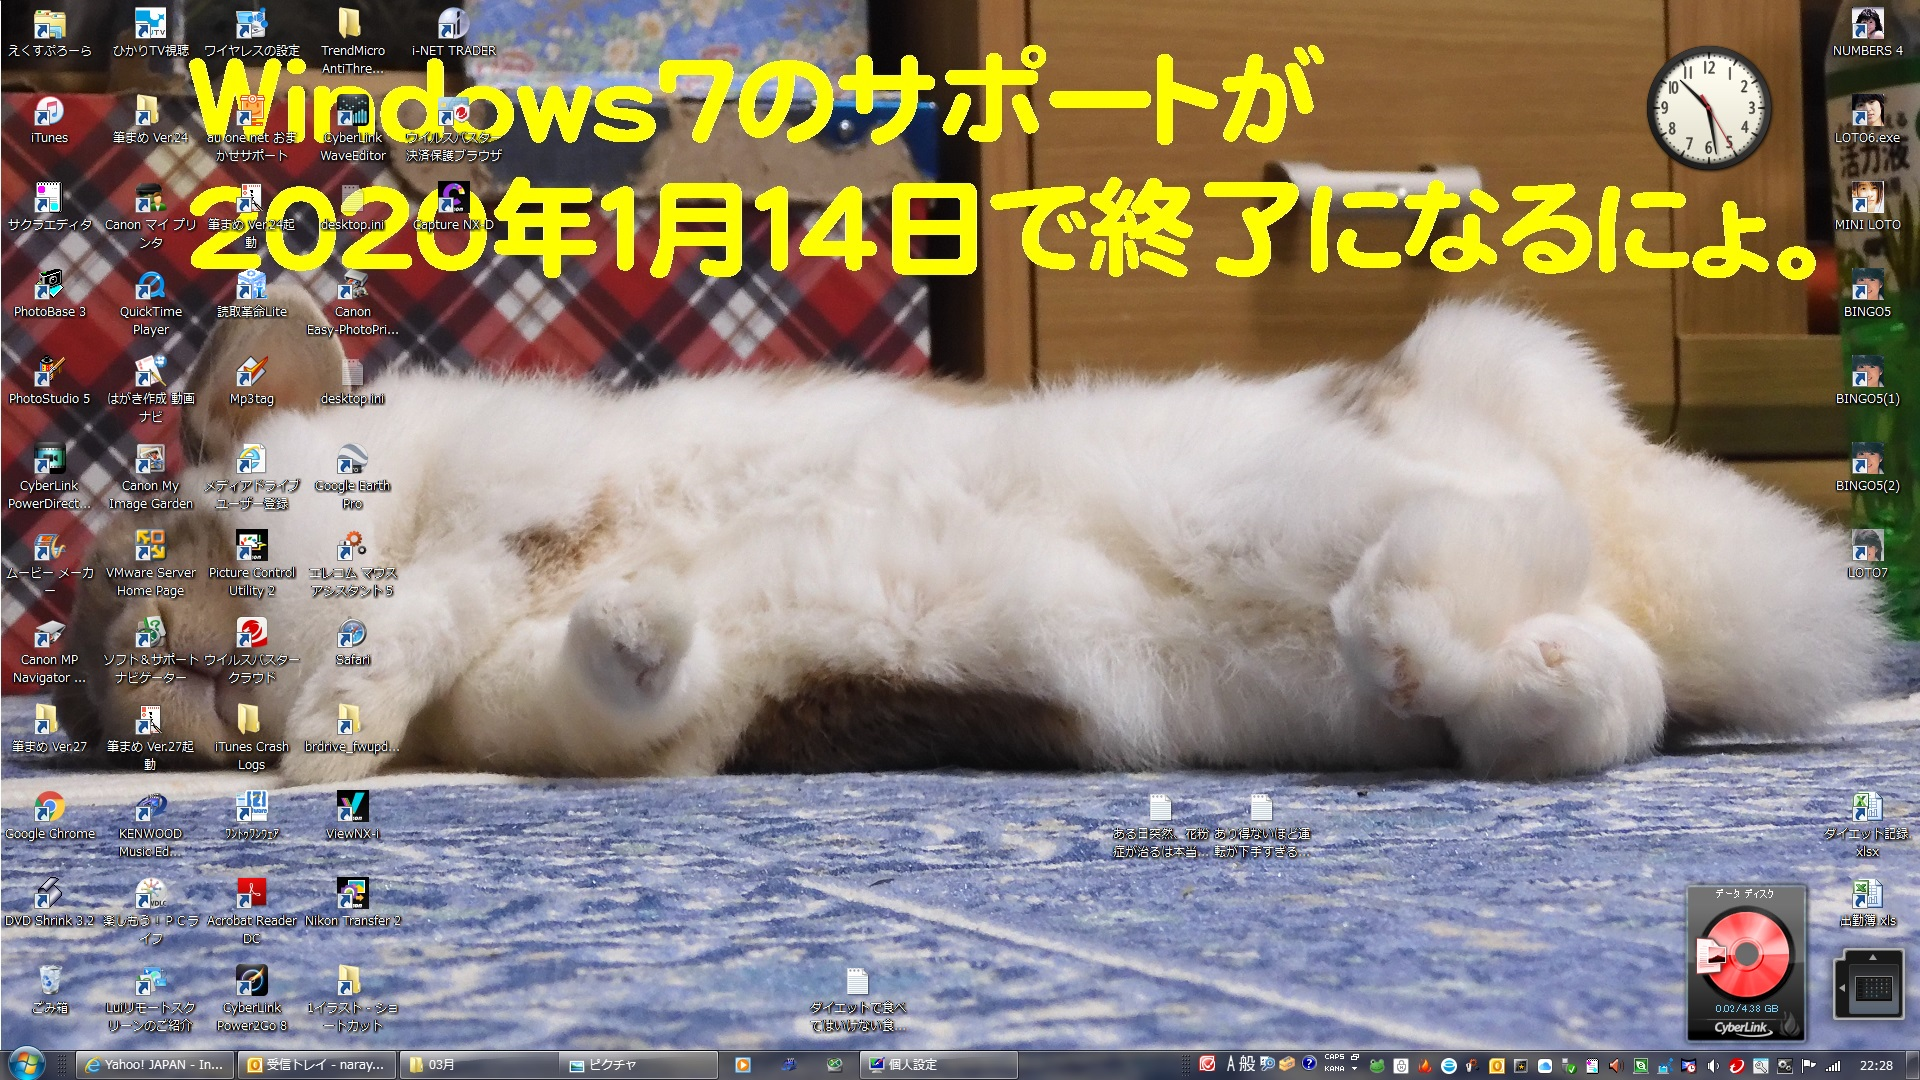 Windows7サポート終了20200114